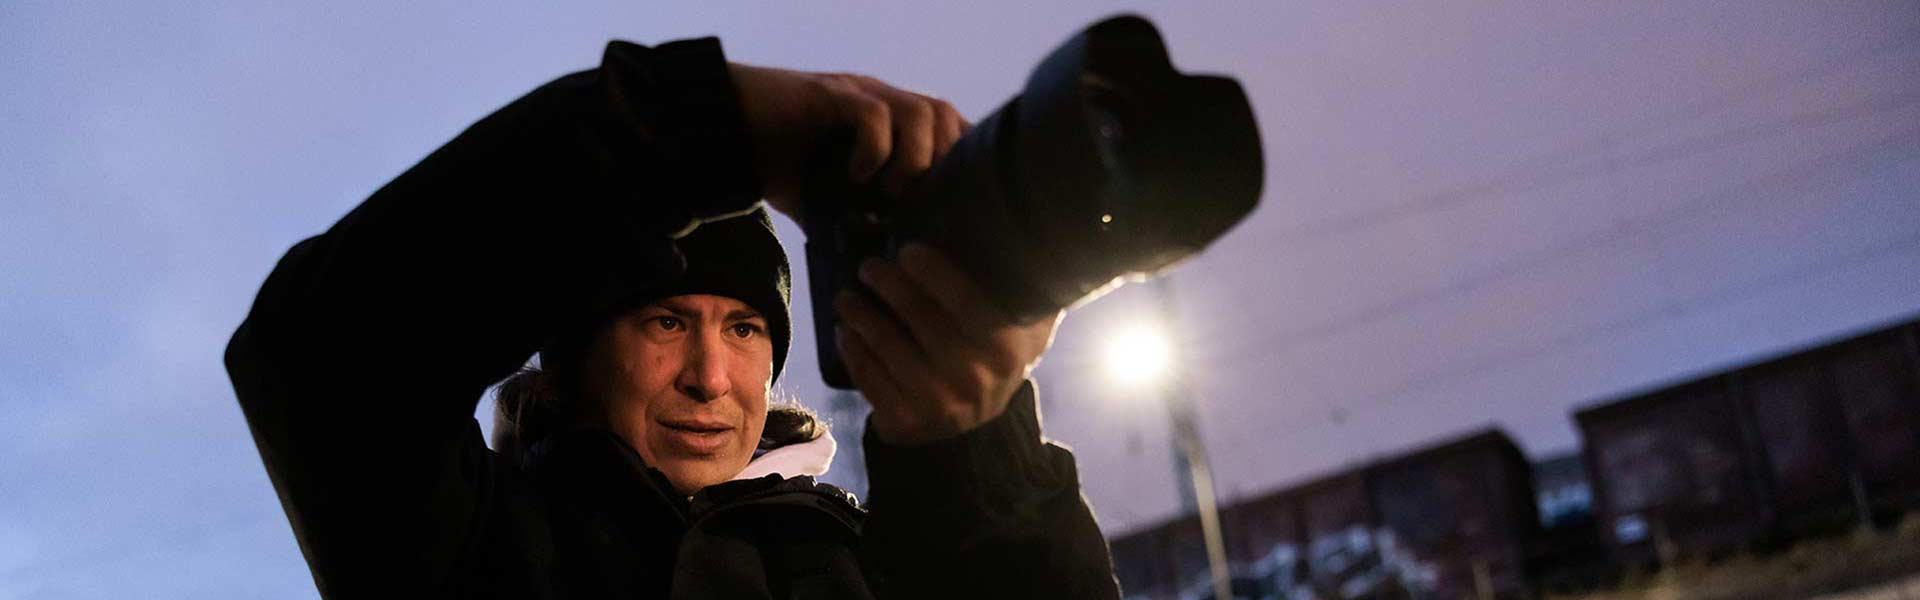 Fotograf bei Dämmerung mit Canon Kamera